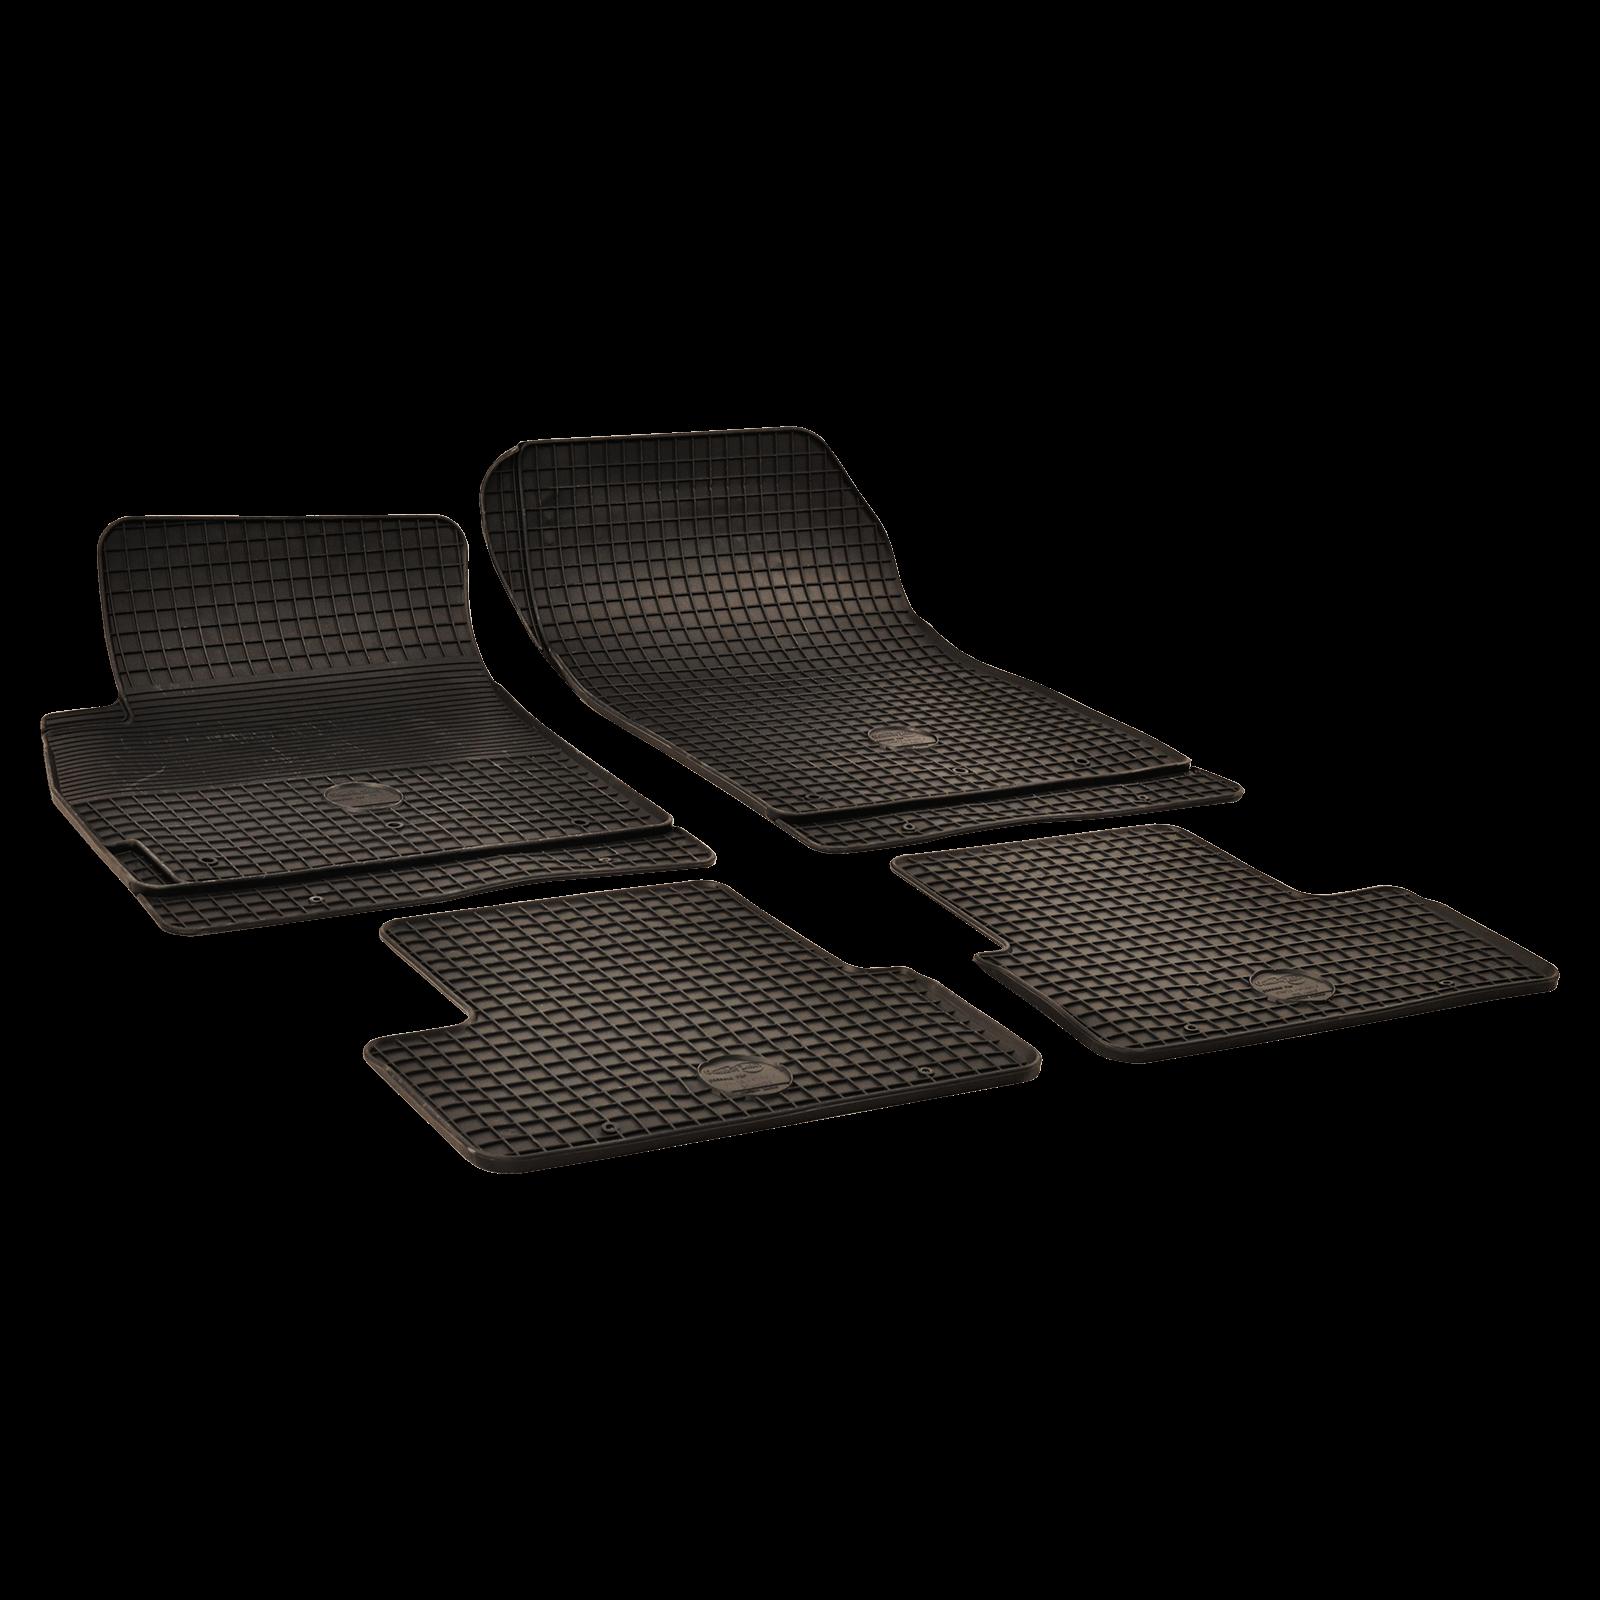 gummi fu matten schwarz f r opel astra j gtc bj. Black Bedroom Furniture Sets. Home Design Ideas